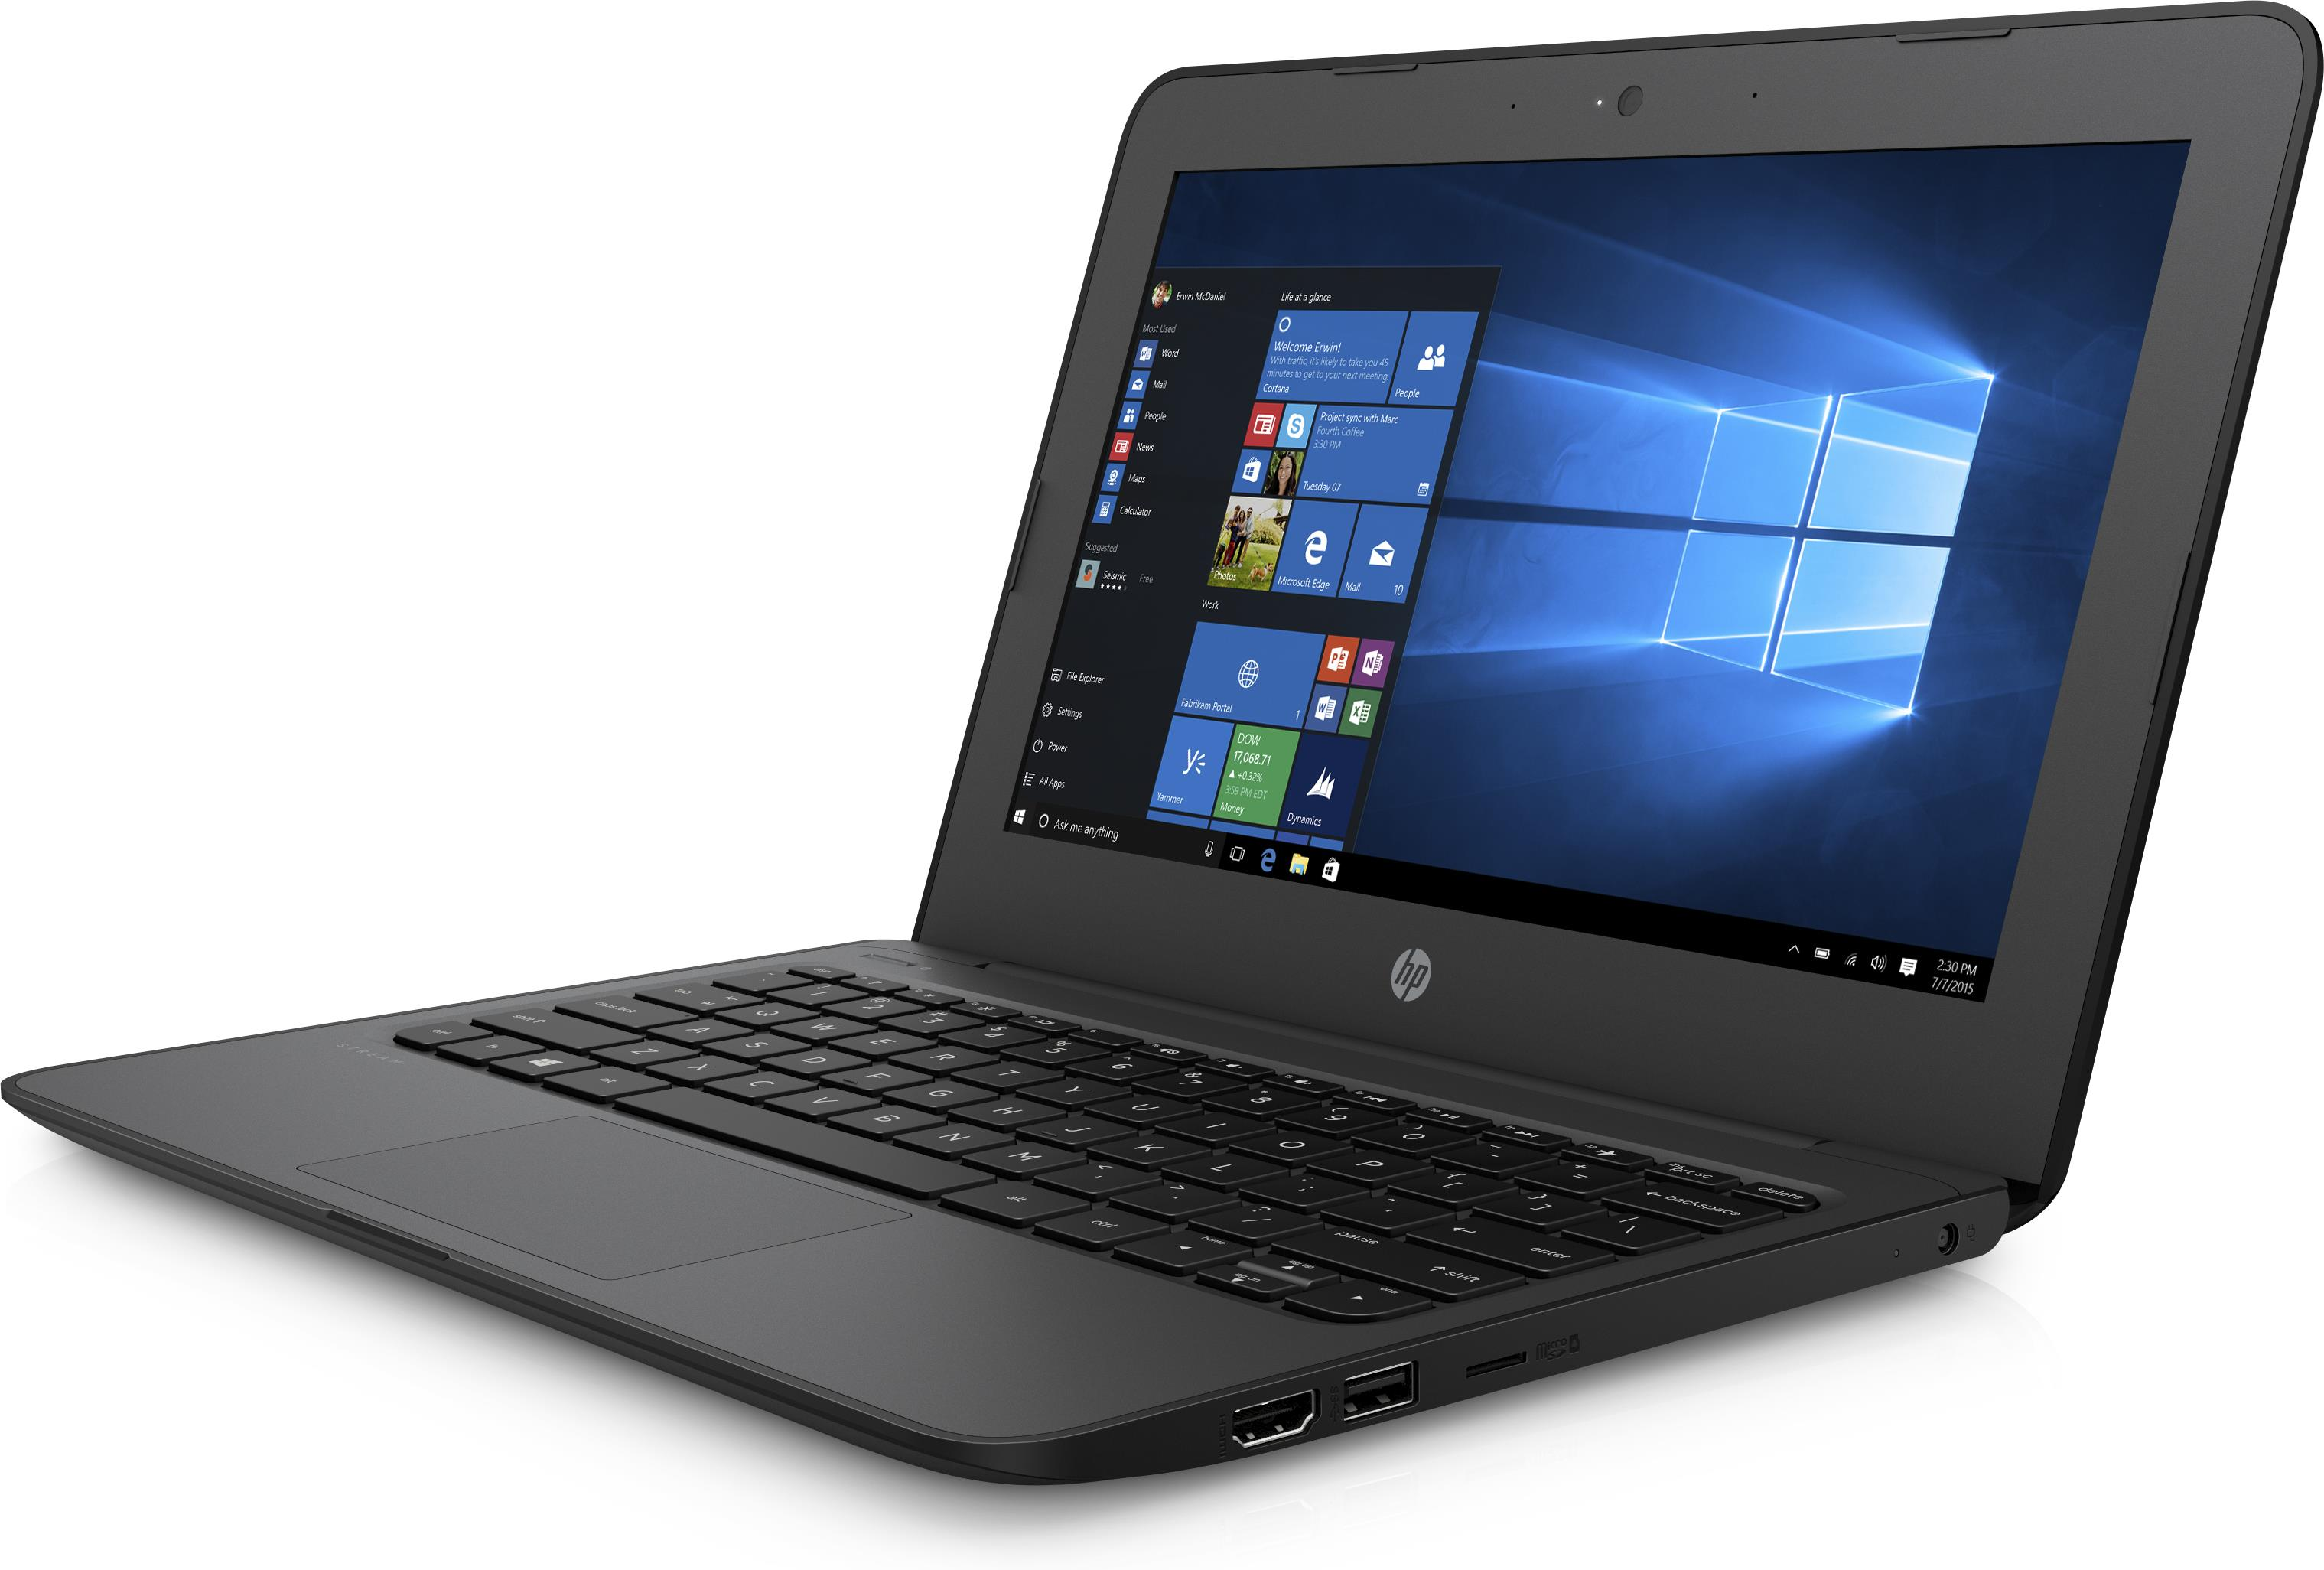 HP Stream 11 Pro G4 EE (11.6 inch) Notebook PC Celeron (N3350) 1.1GHz 4GB 64GB eMMC WLAN BT Windows 10 Pro (HD Graphics 500)